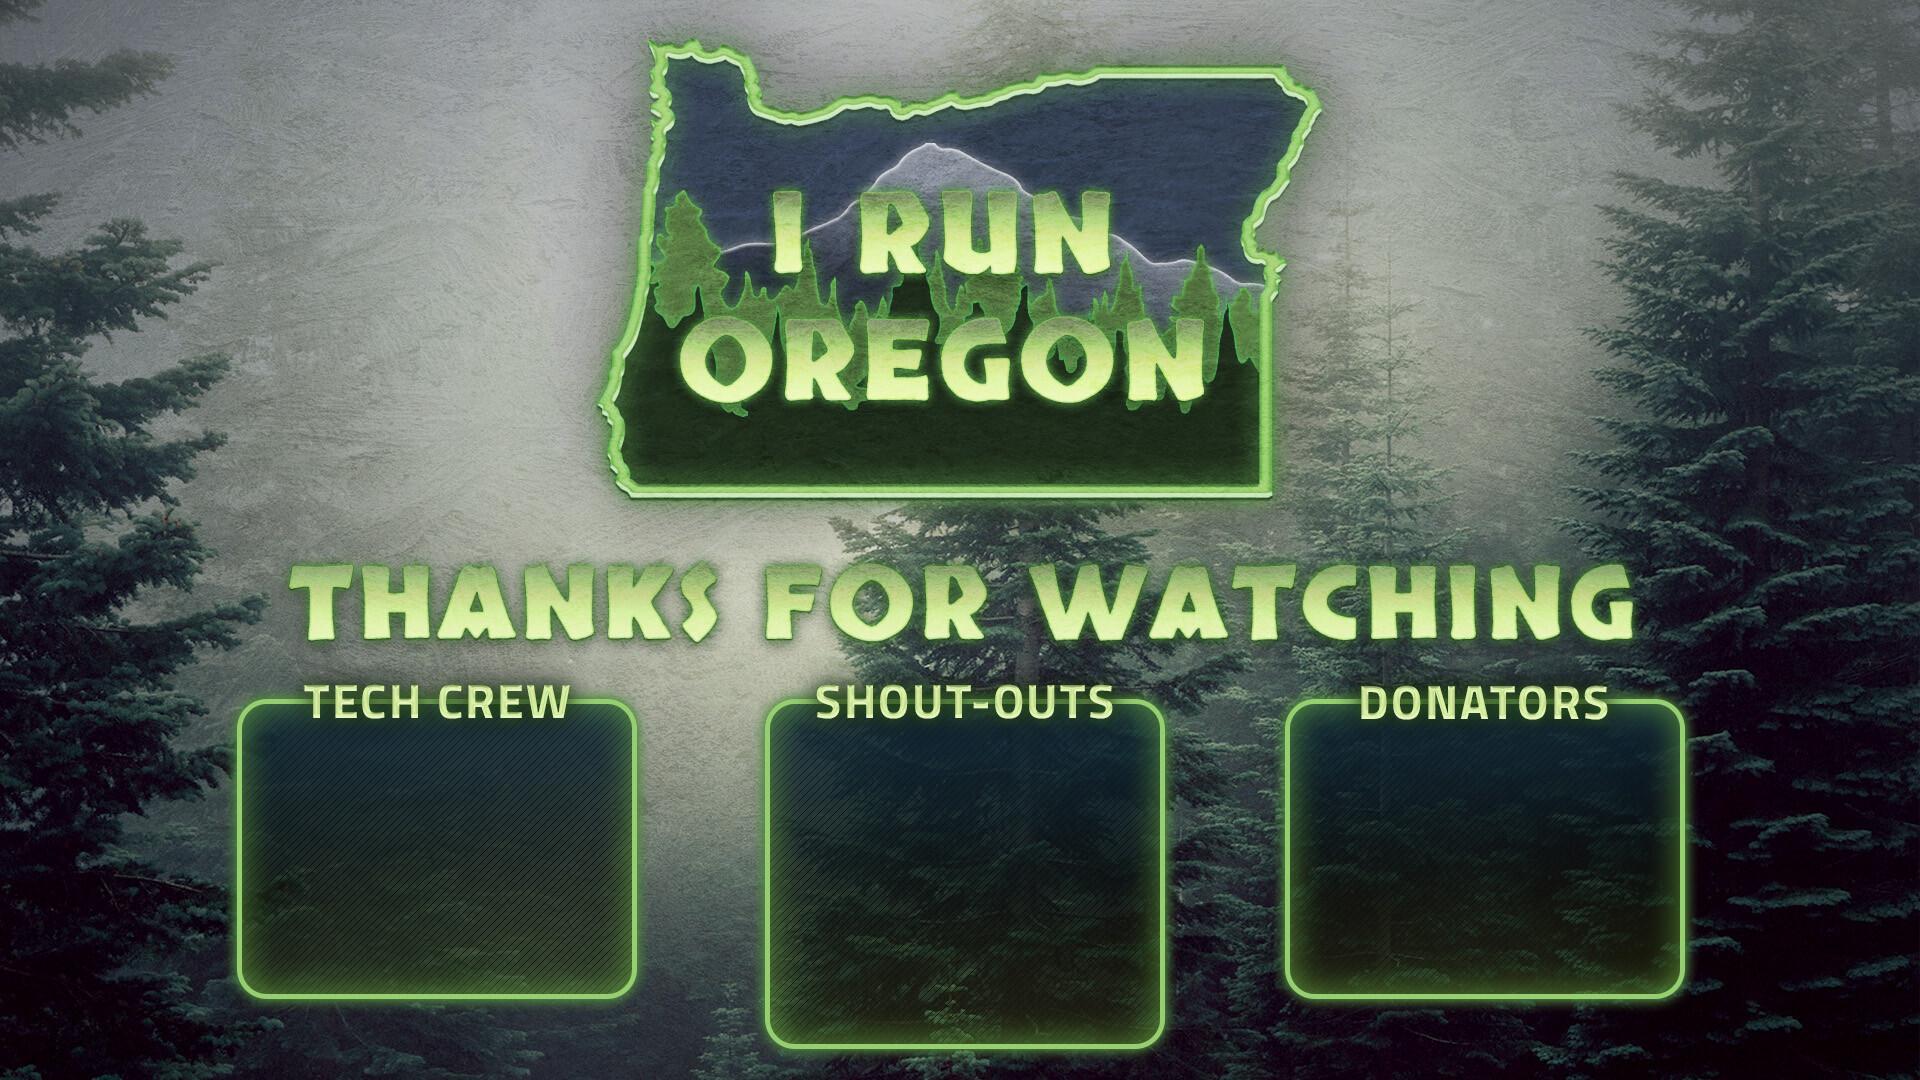 ArtStation - I Run Oregon Stream Overlay and Logo, Jacob